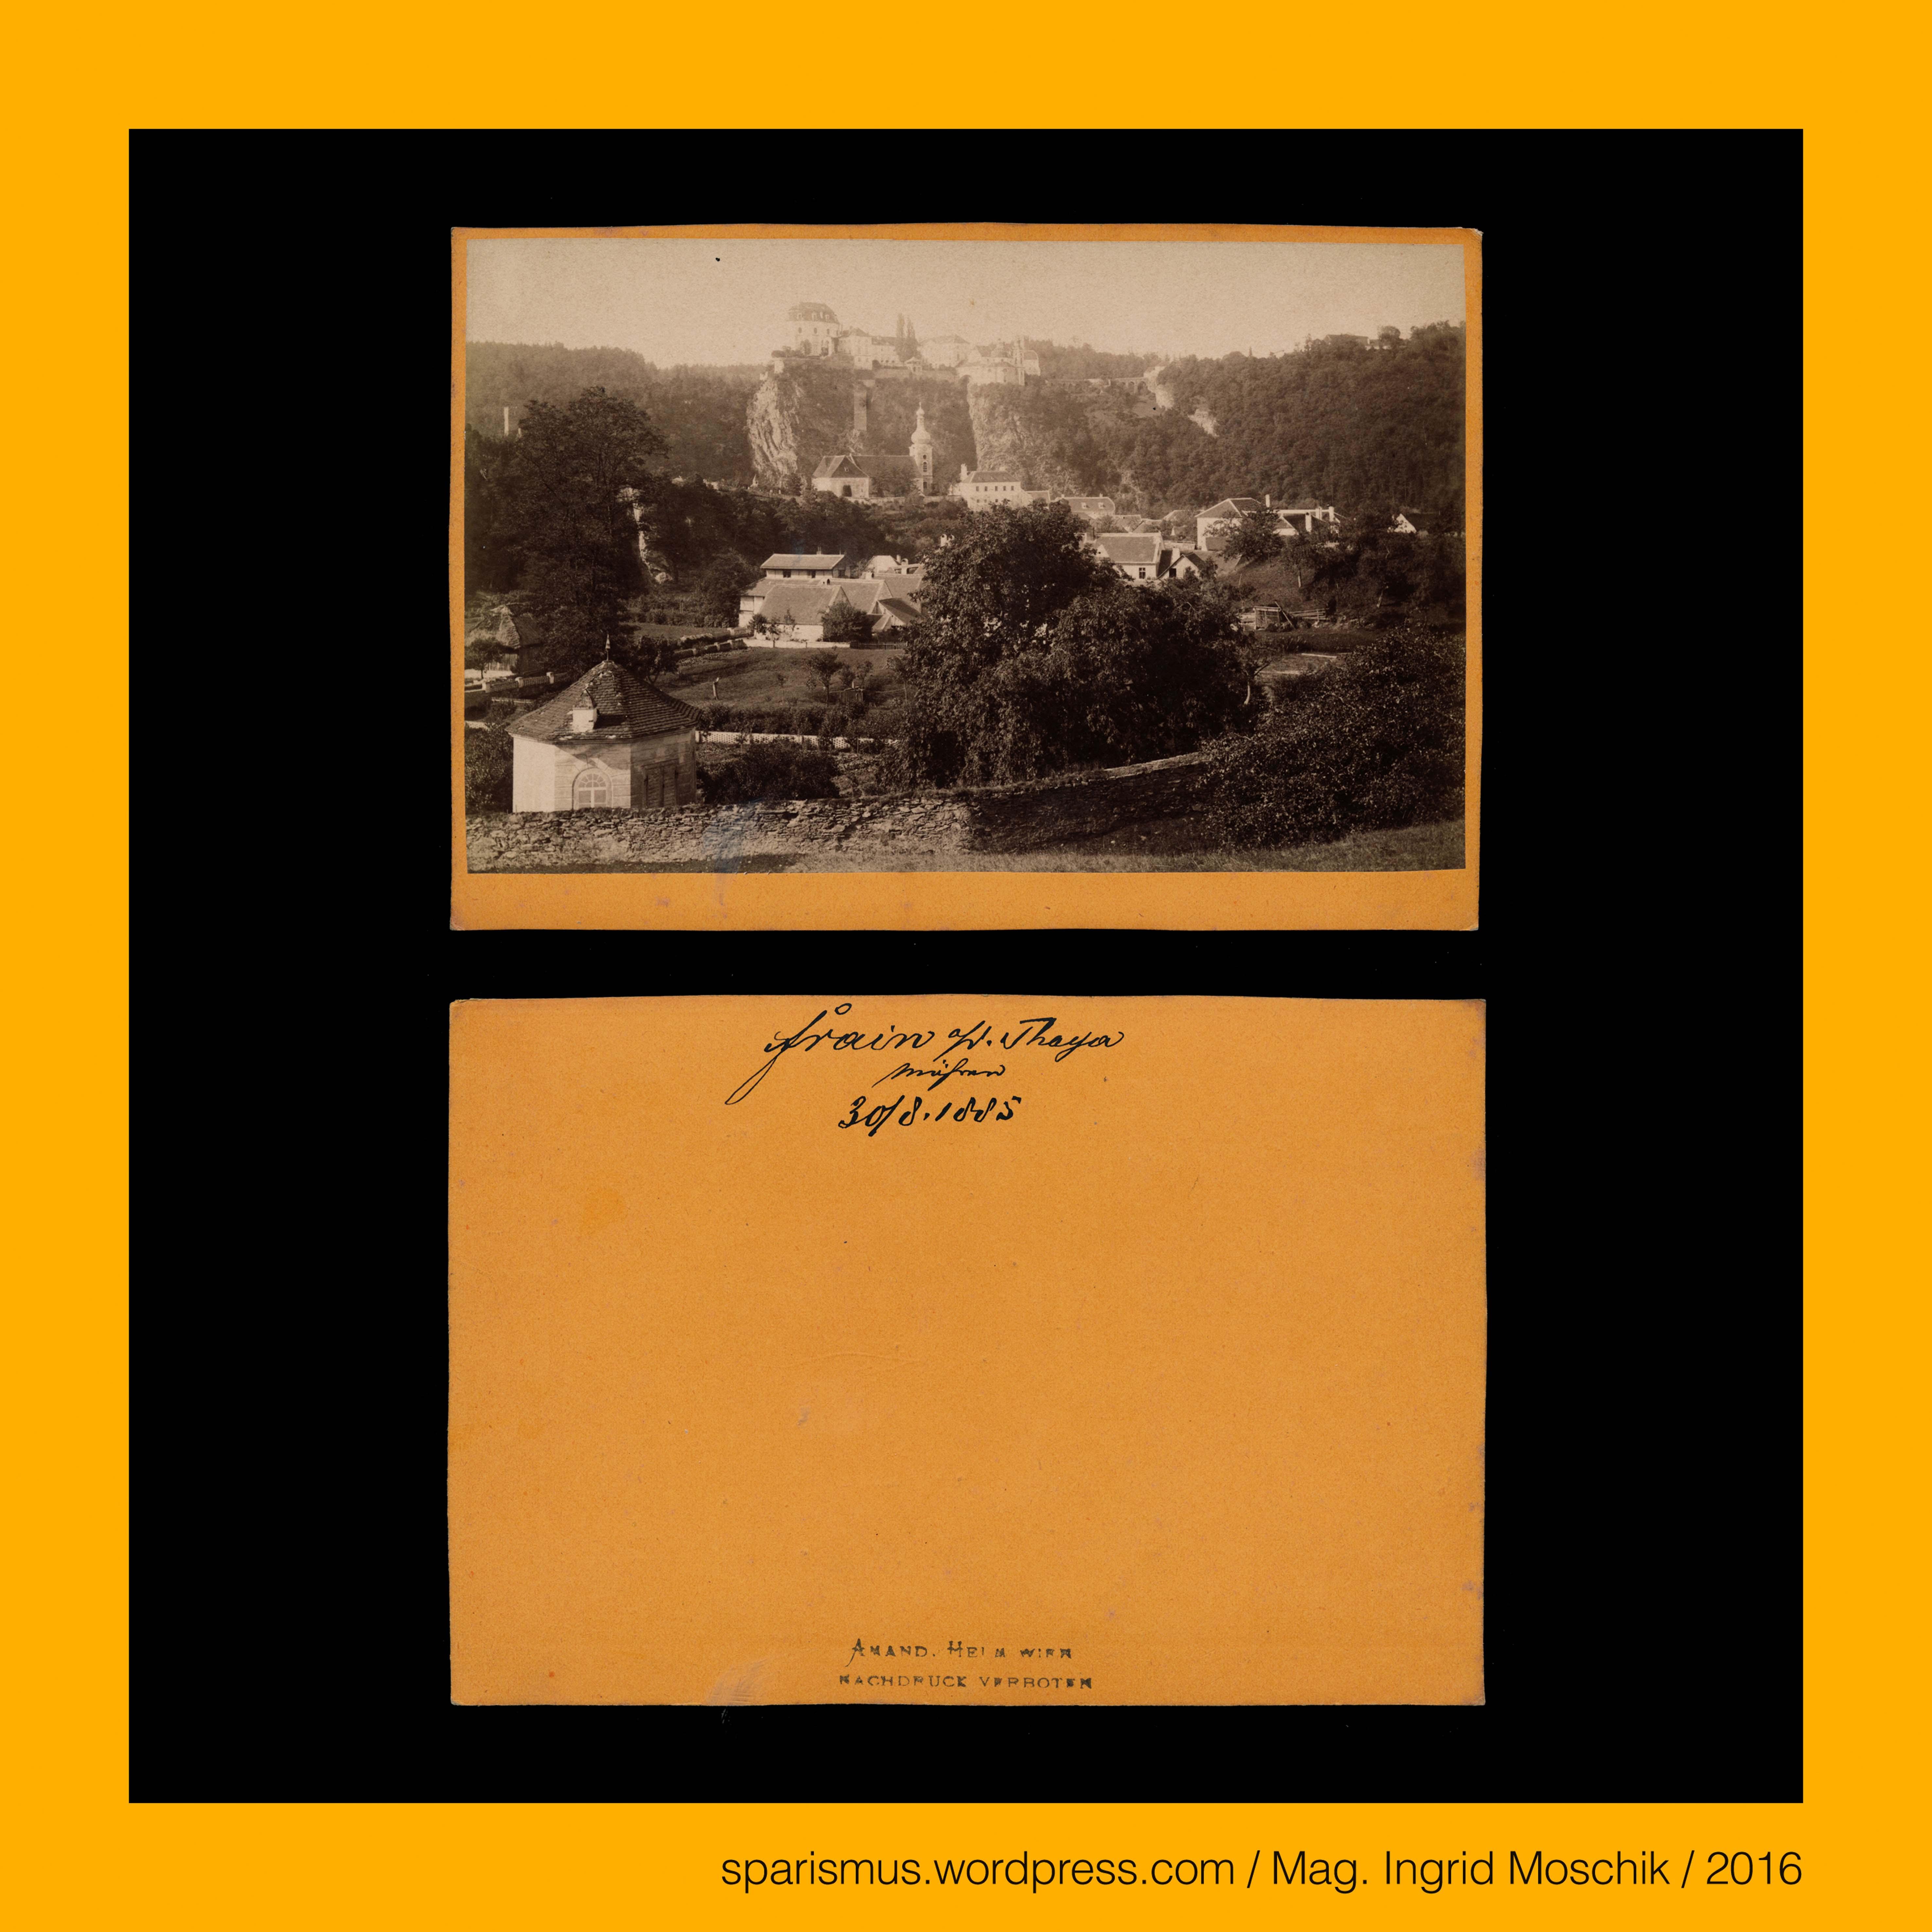 amand-helm-wien-fotograf-frain-an-der-thaya-vranov-nad-duji-1885 Impressionnant De Devant De Maison Schème